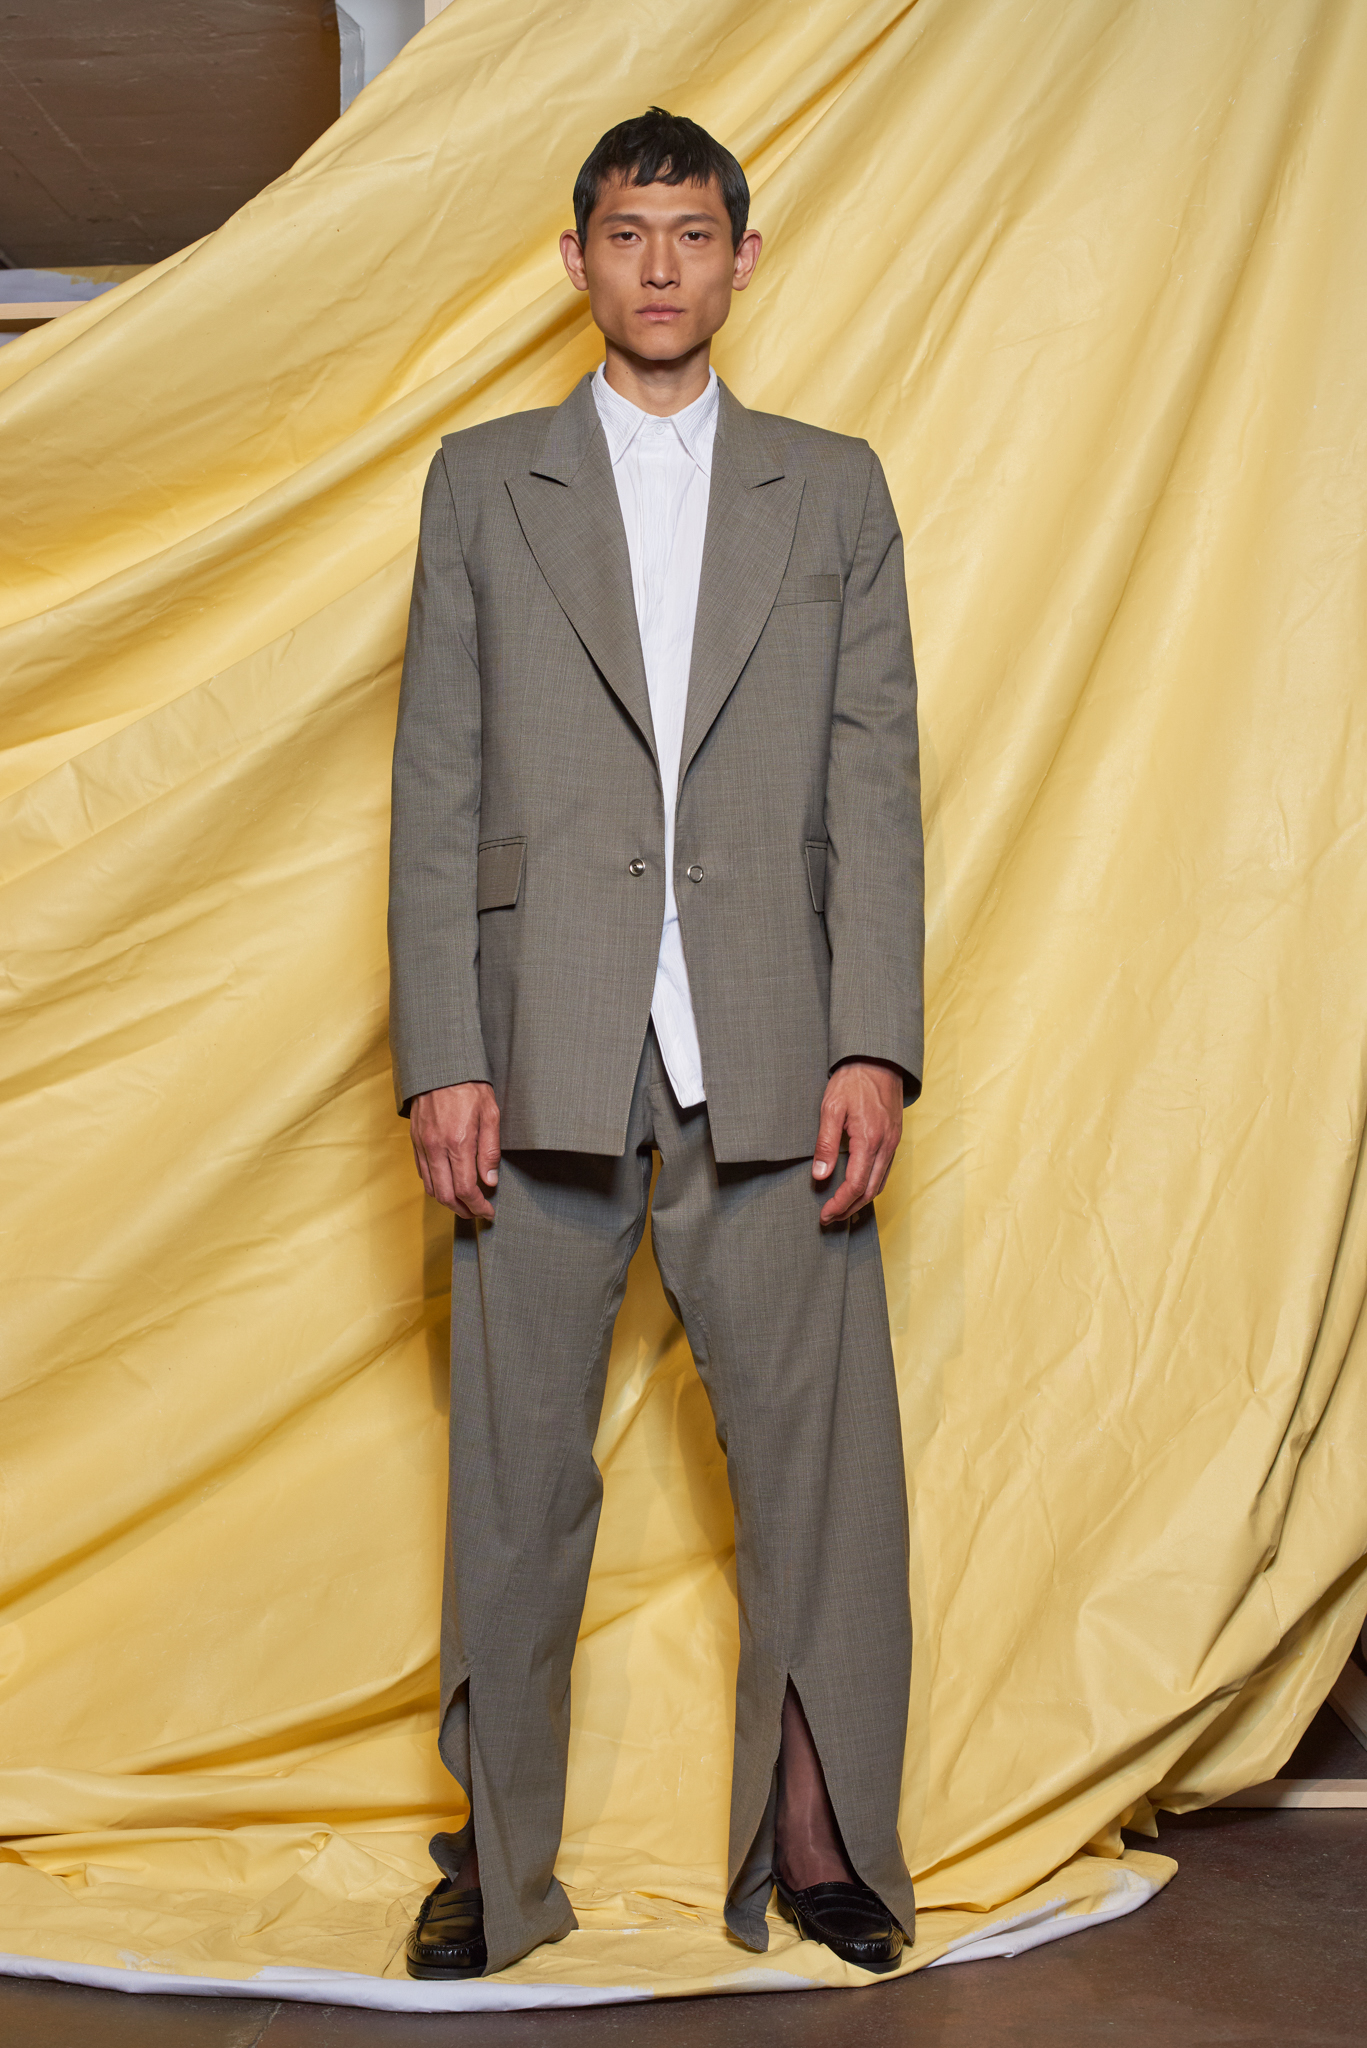 Bianca Saunders Presentation Men's Spring 2020 photographed in London on 09 June 2019